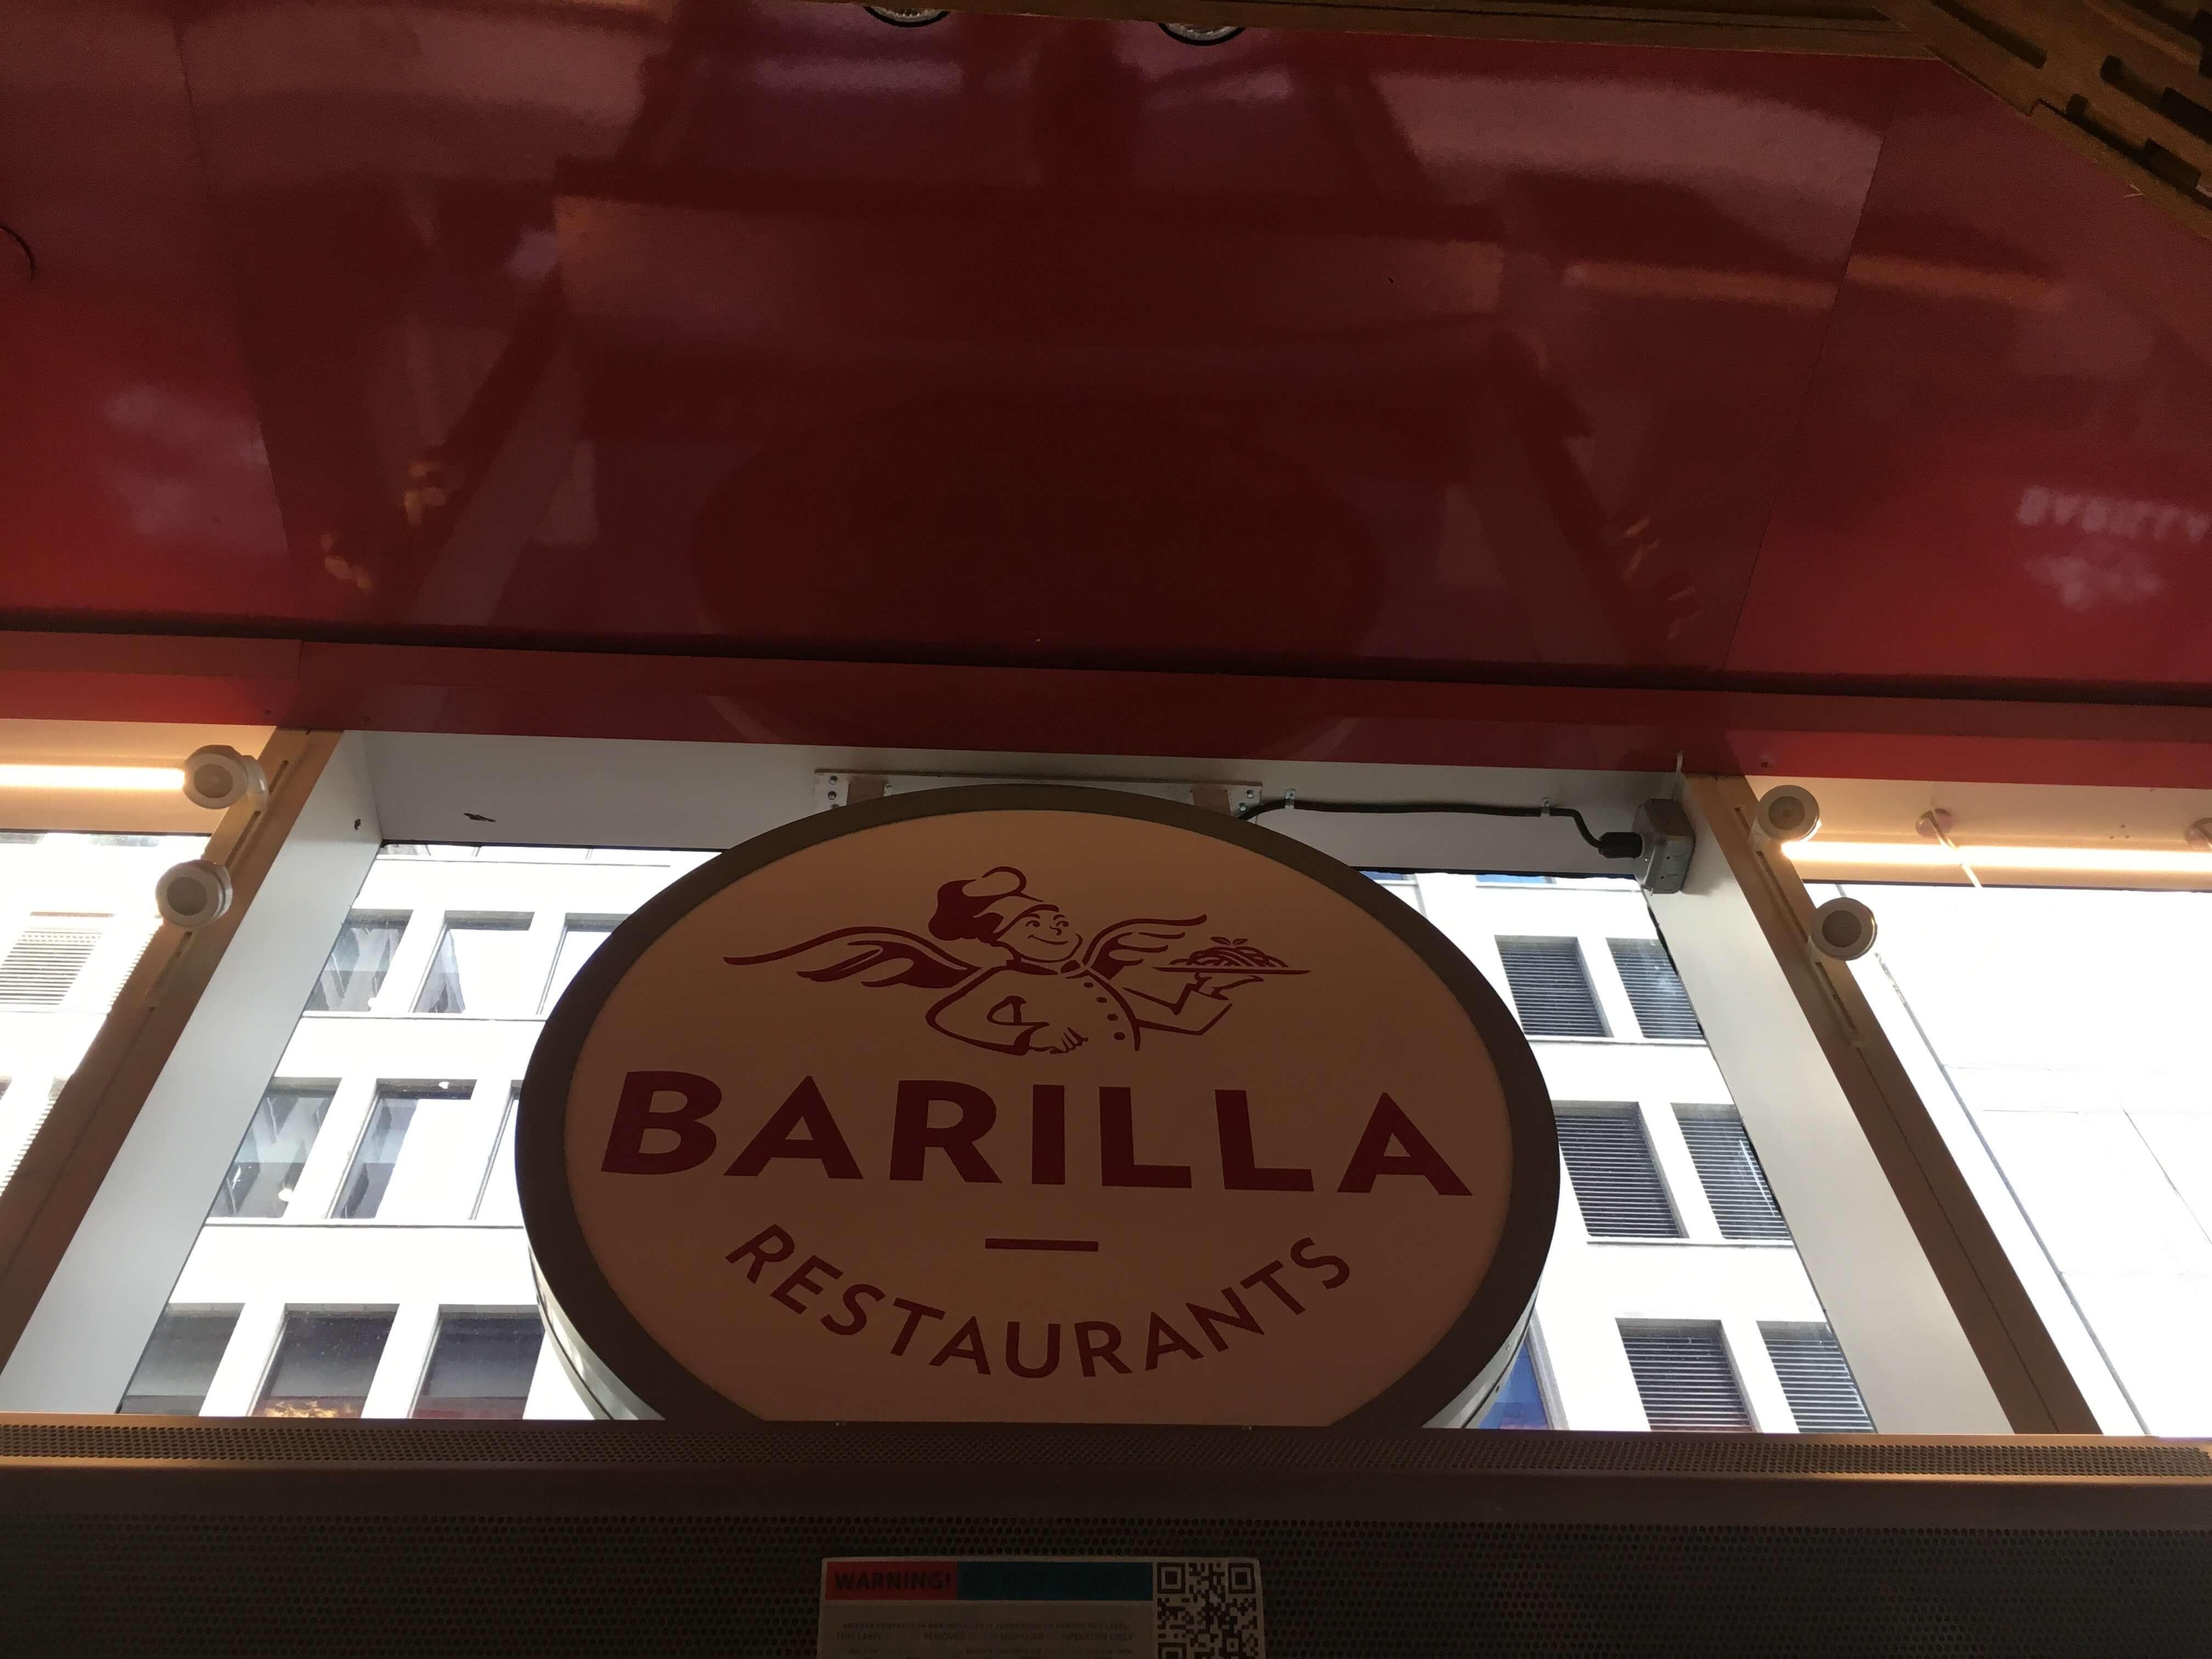 barilla restaurants herald square